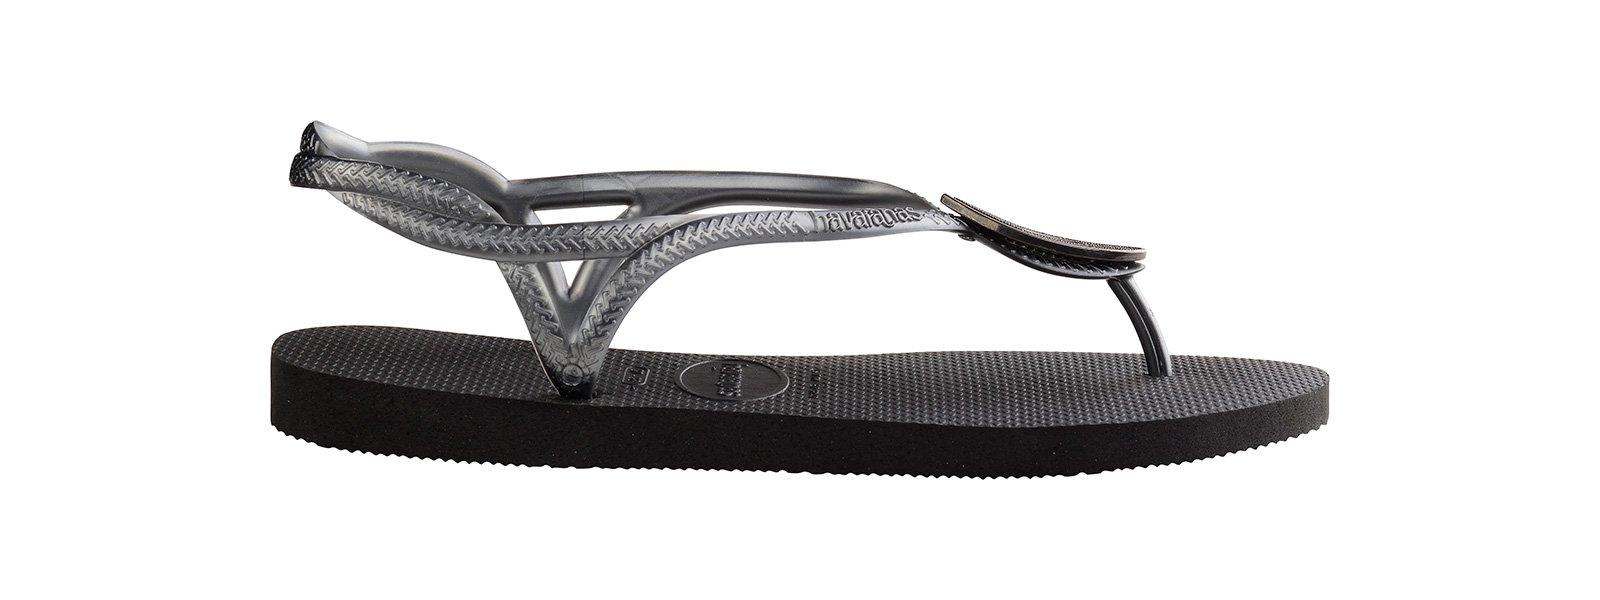 7fda3363f334 Sandals Black Flip Flops - Havaianas Luna Special Black